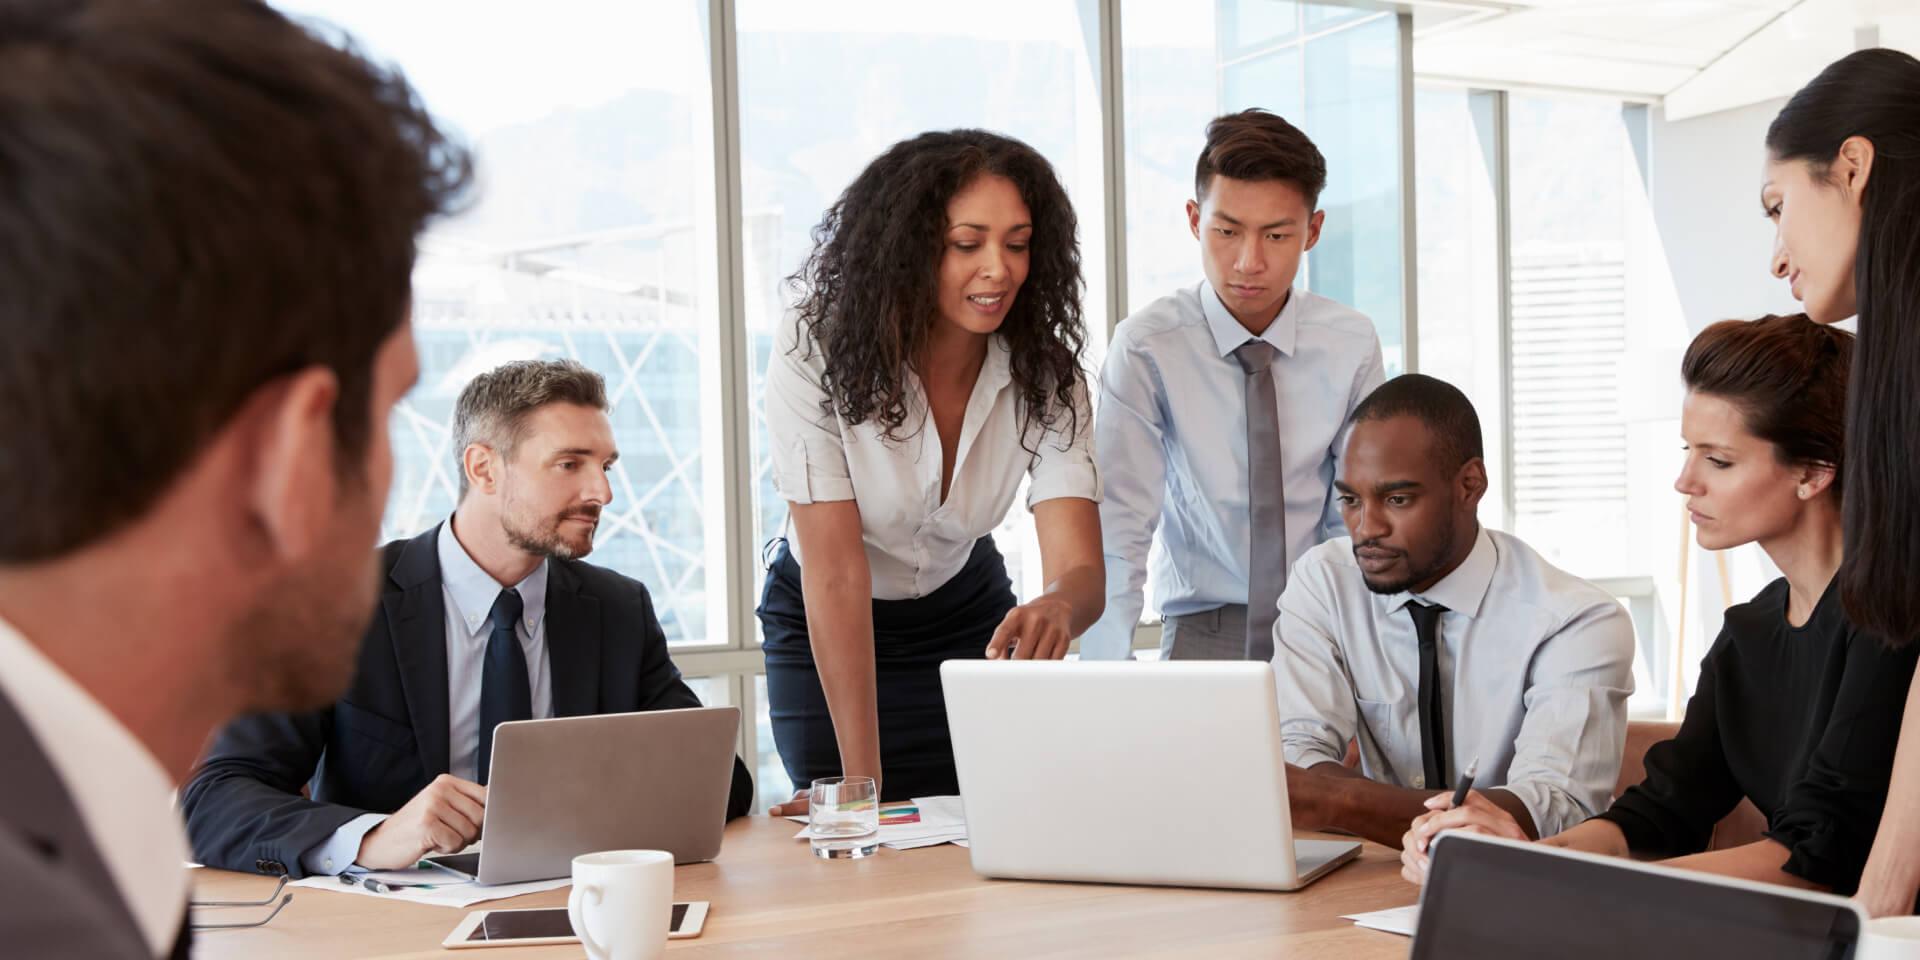 Leading Enterprise Software Company